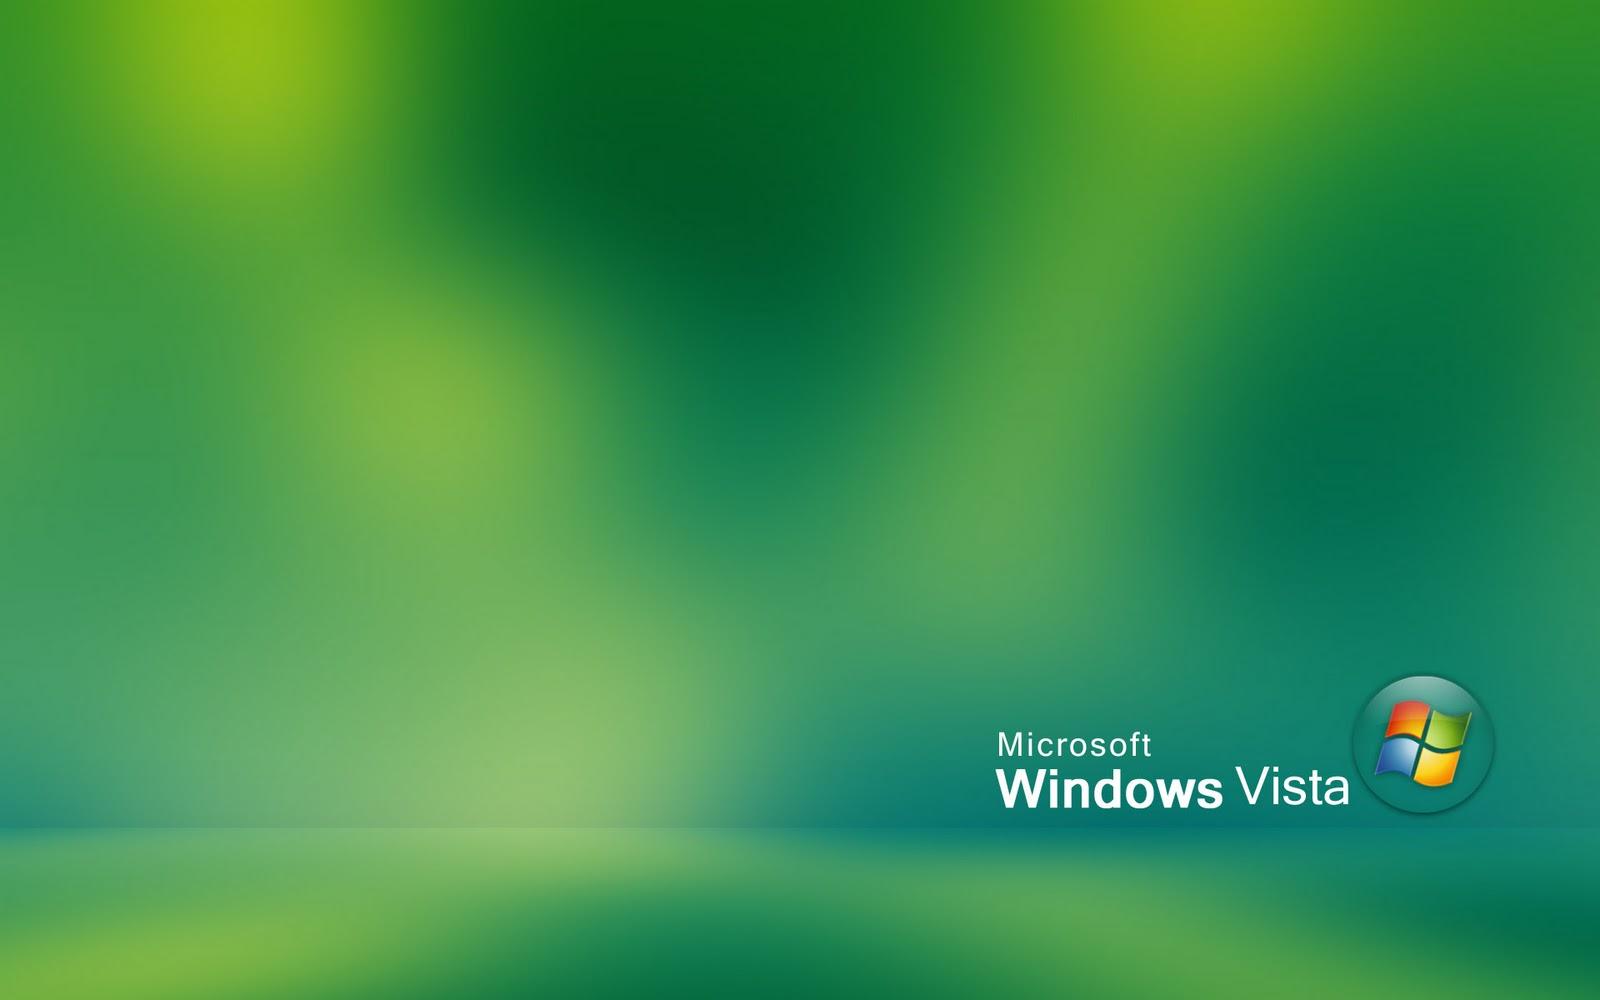 http://1.bp.blogspot.com/-udOiaoIFgcA/TWaAnjQdmaI/AAAAAAAAAos/0kvrM_FE_RE/s1600/Vista+Wallpaper+%252897%2529.jpg